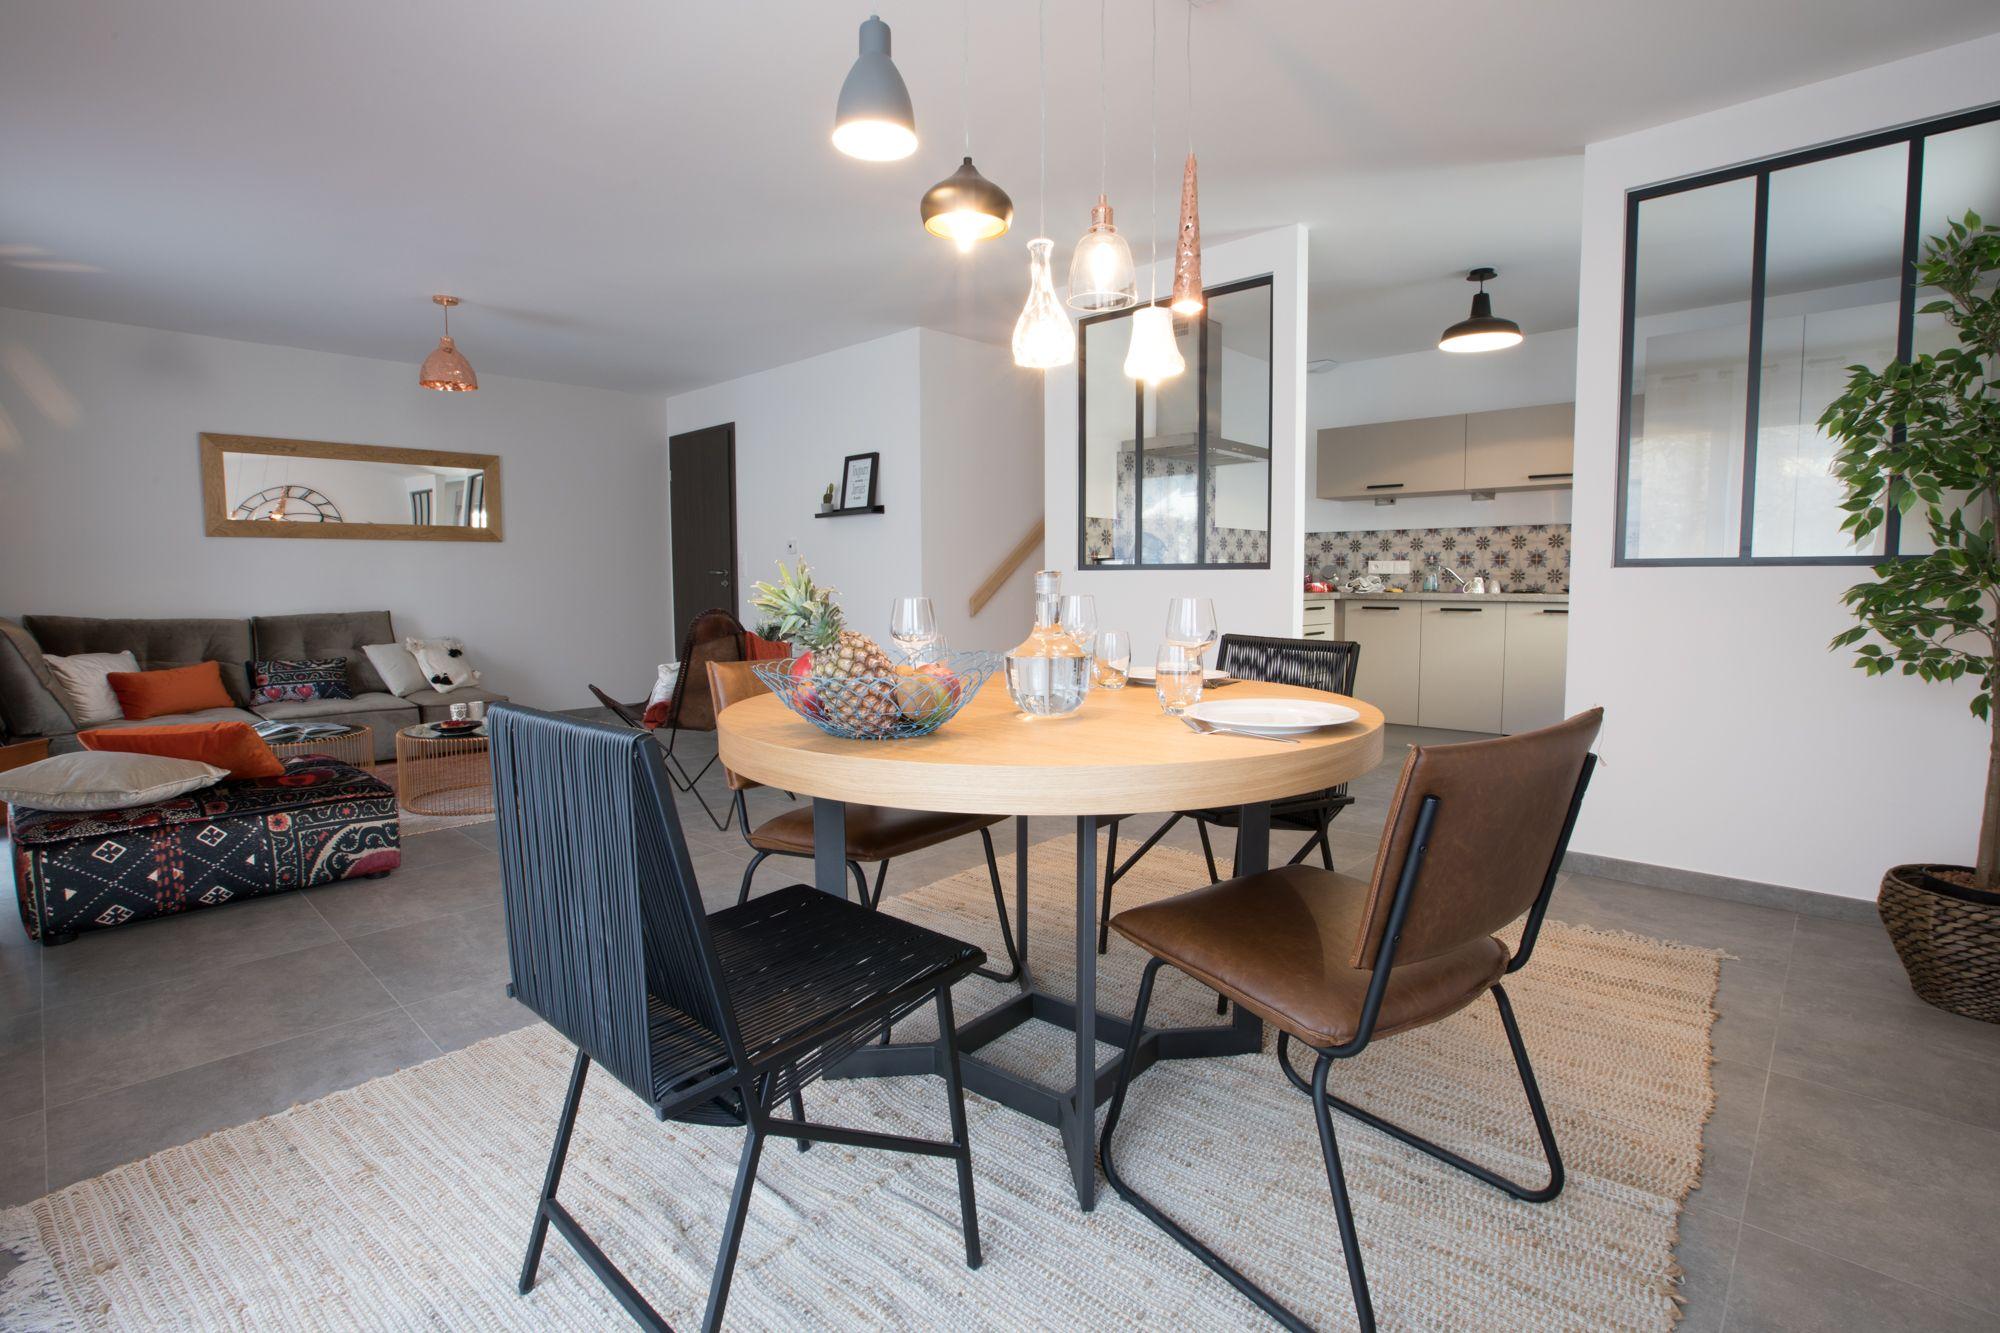 Cuisine Scandinave Table Ronde Chaises Eames Suspension